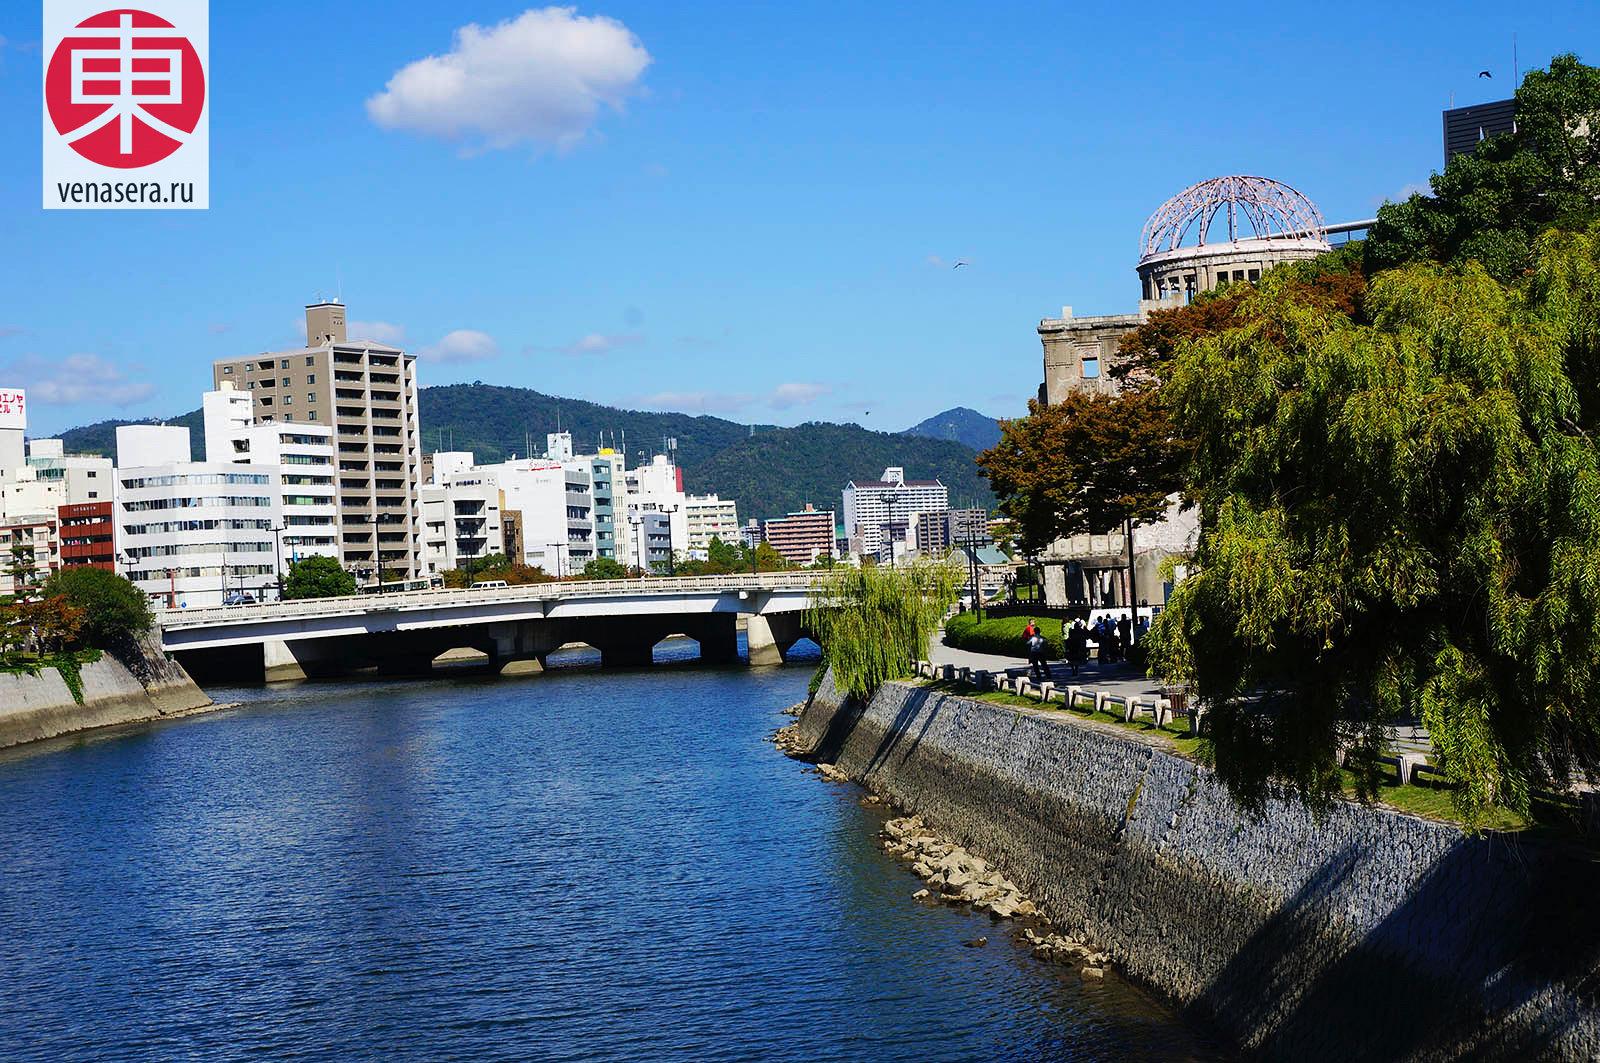 Мост Айой, Aioi Bridge, 相生橋, Купол атомного взрыва, Купол Гэмбаку, Атомный купол, Bomb Dome, 原爆ドーム, Хиросима, Hiroshima, 広島, Хонсю, Honshu, 本州, Япония, Japan, 日本.